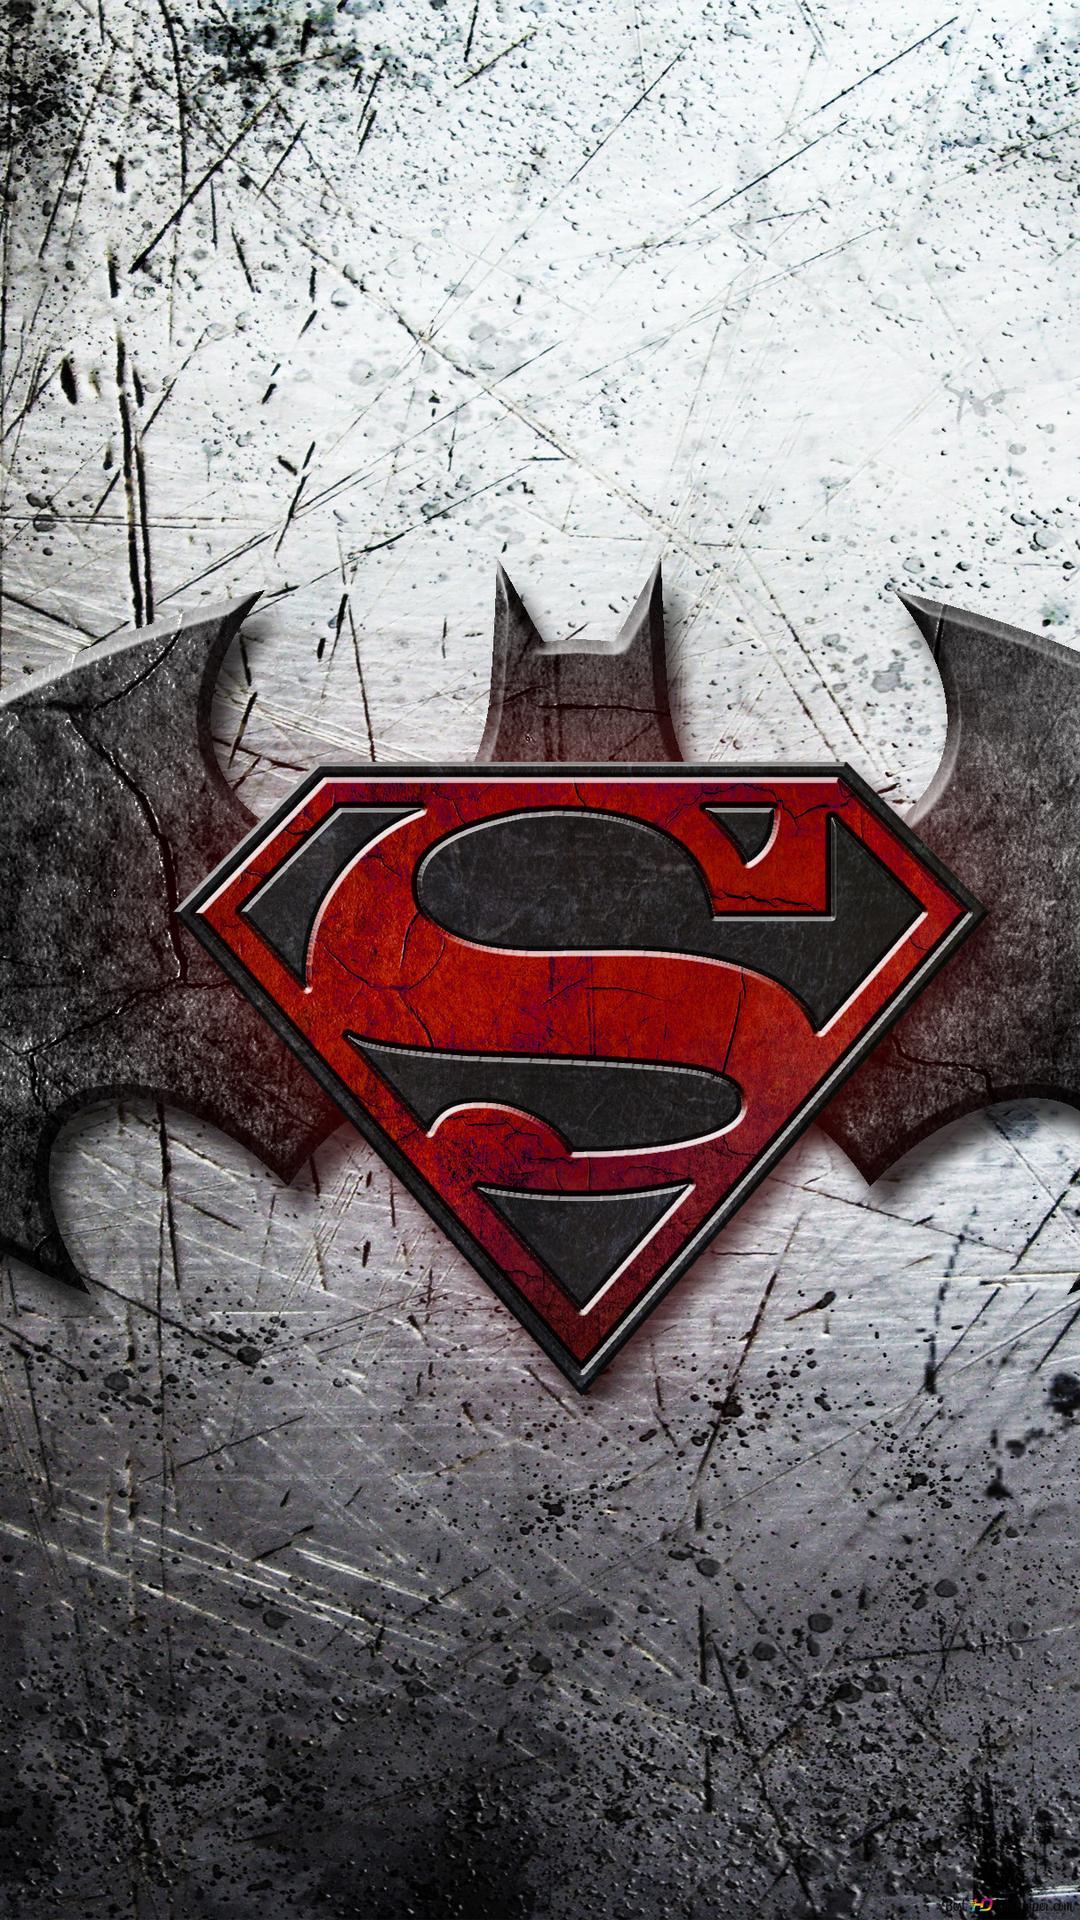 Descargar Fondo De Pantalla Batman Vs Superman El Origen De